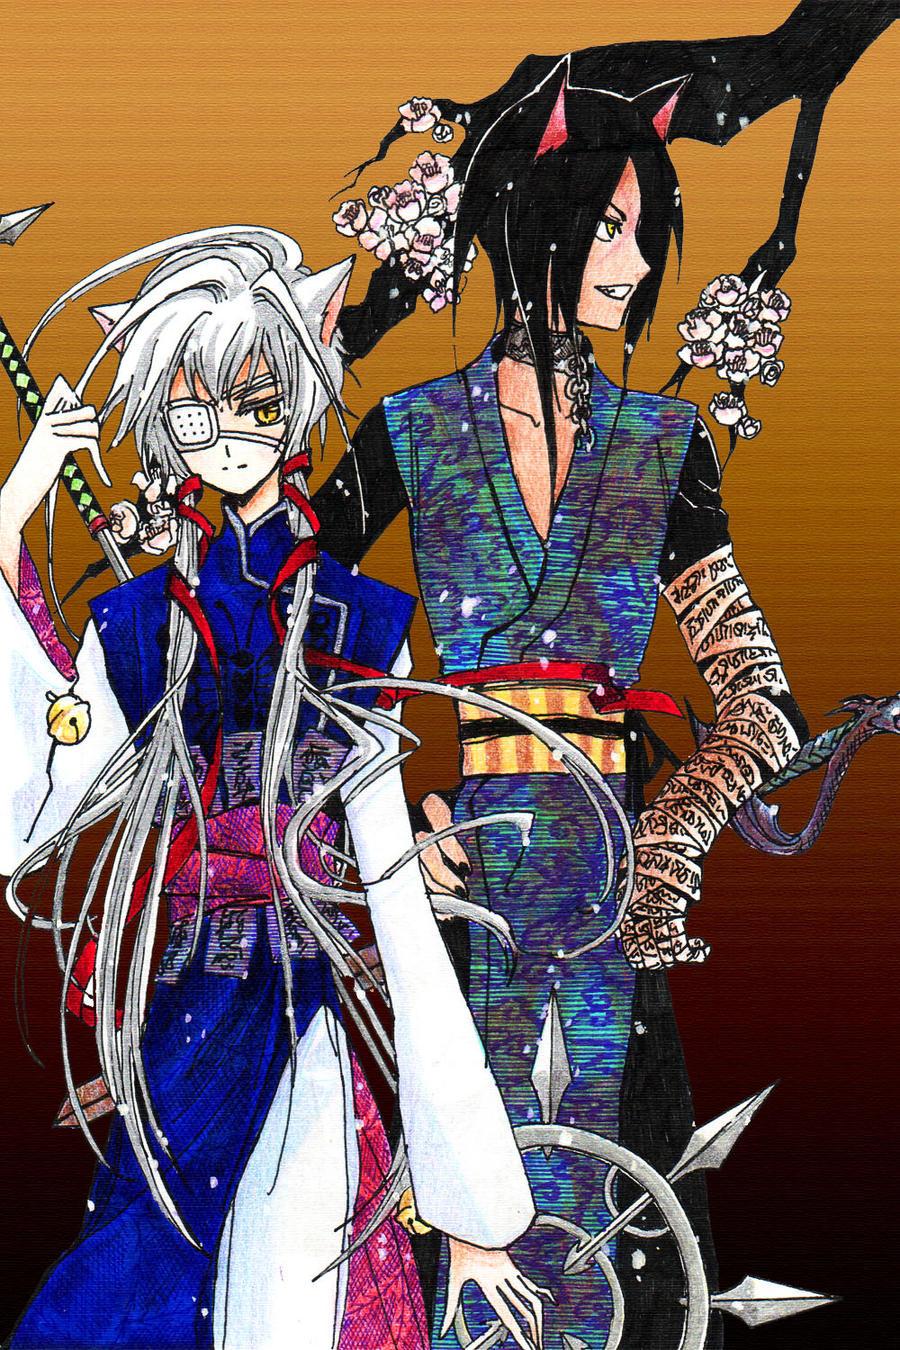 Kitsune and Inugami by Cioccolatodorima on DeviantArt